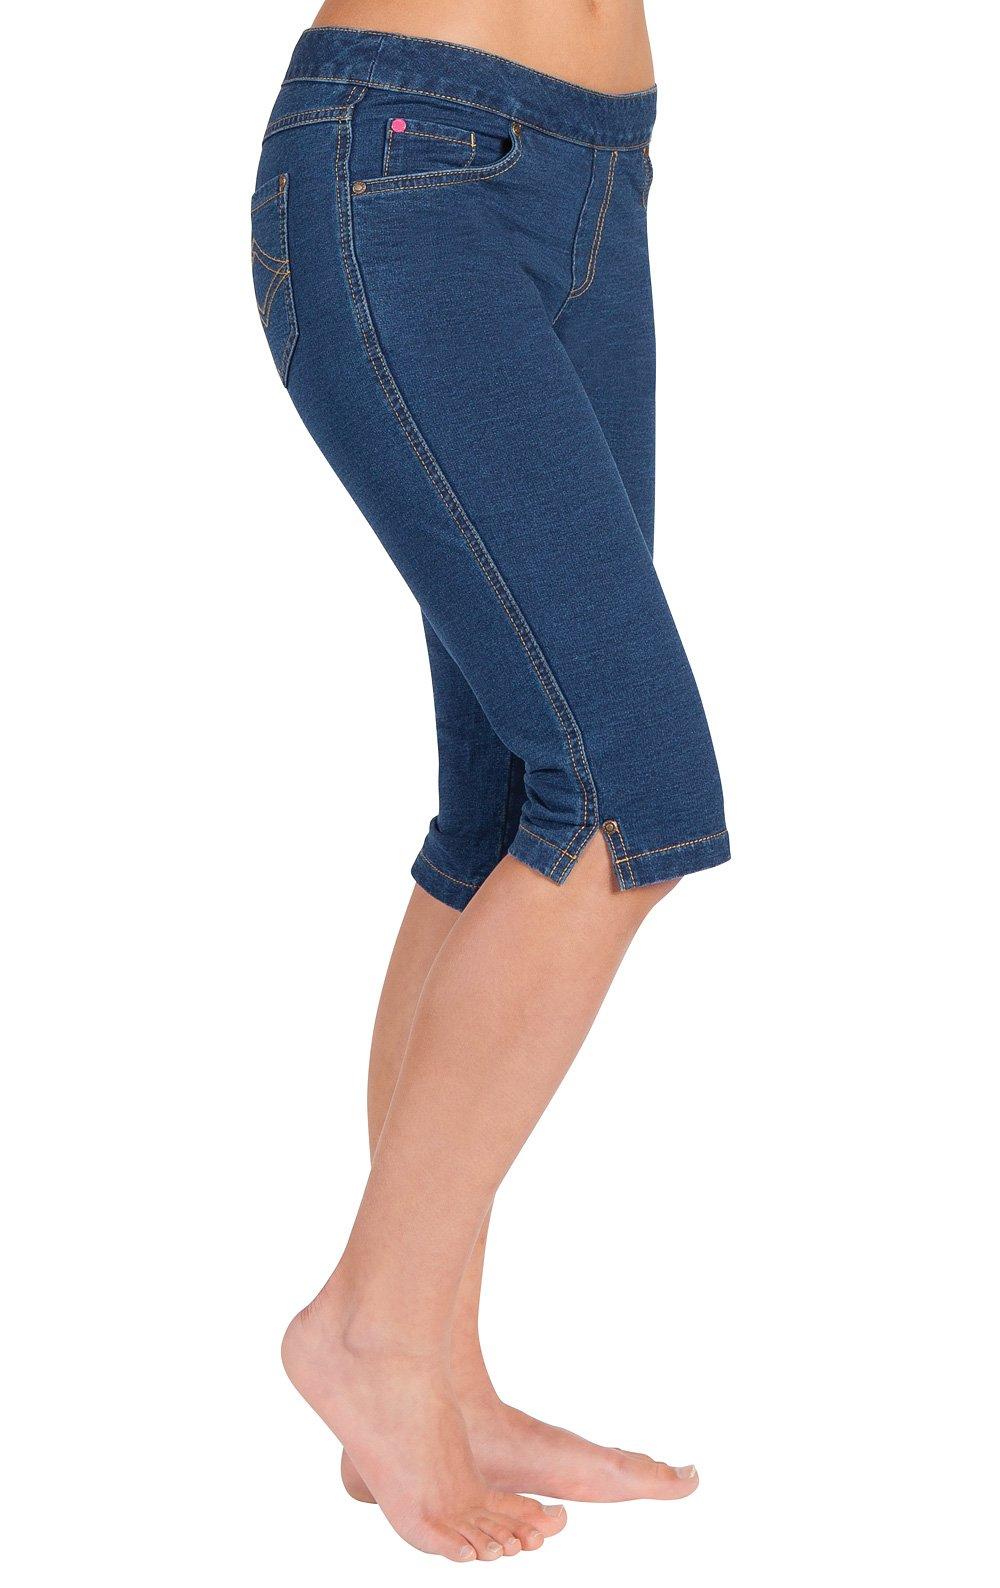 894d925a2d8 PajamaJeans Bermuda Shorts for Women - Capri Jeggings - Denim Fit